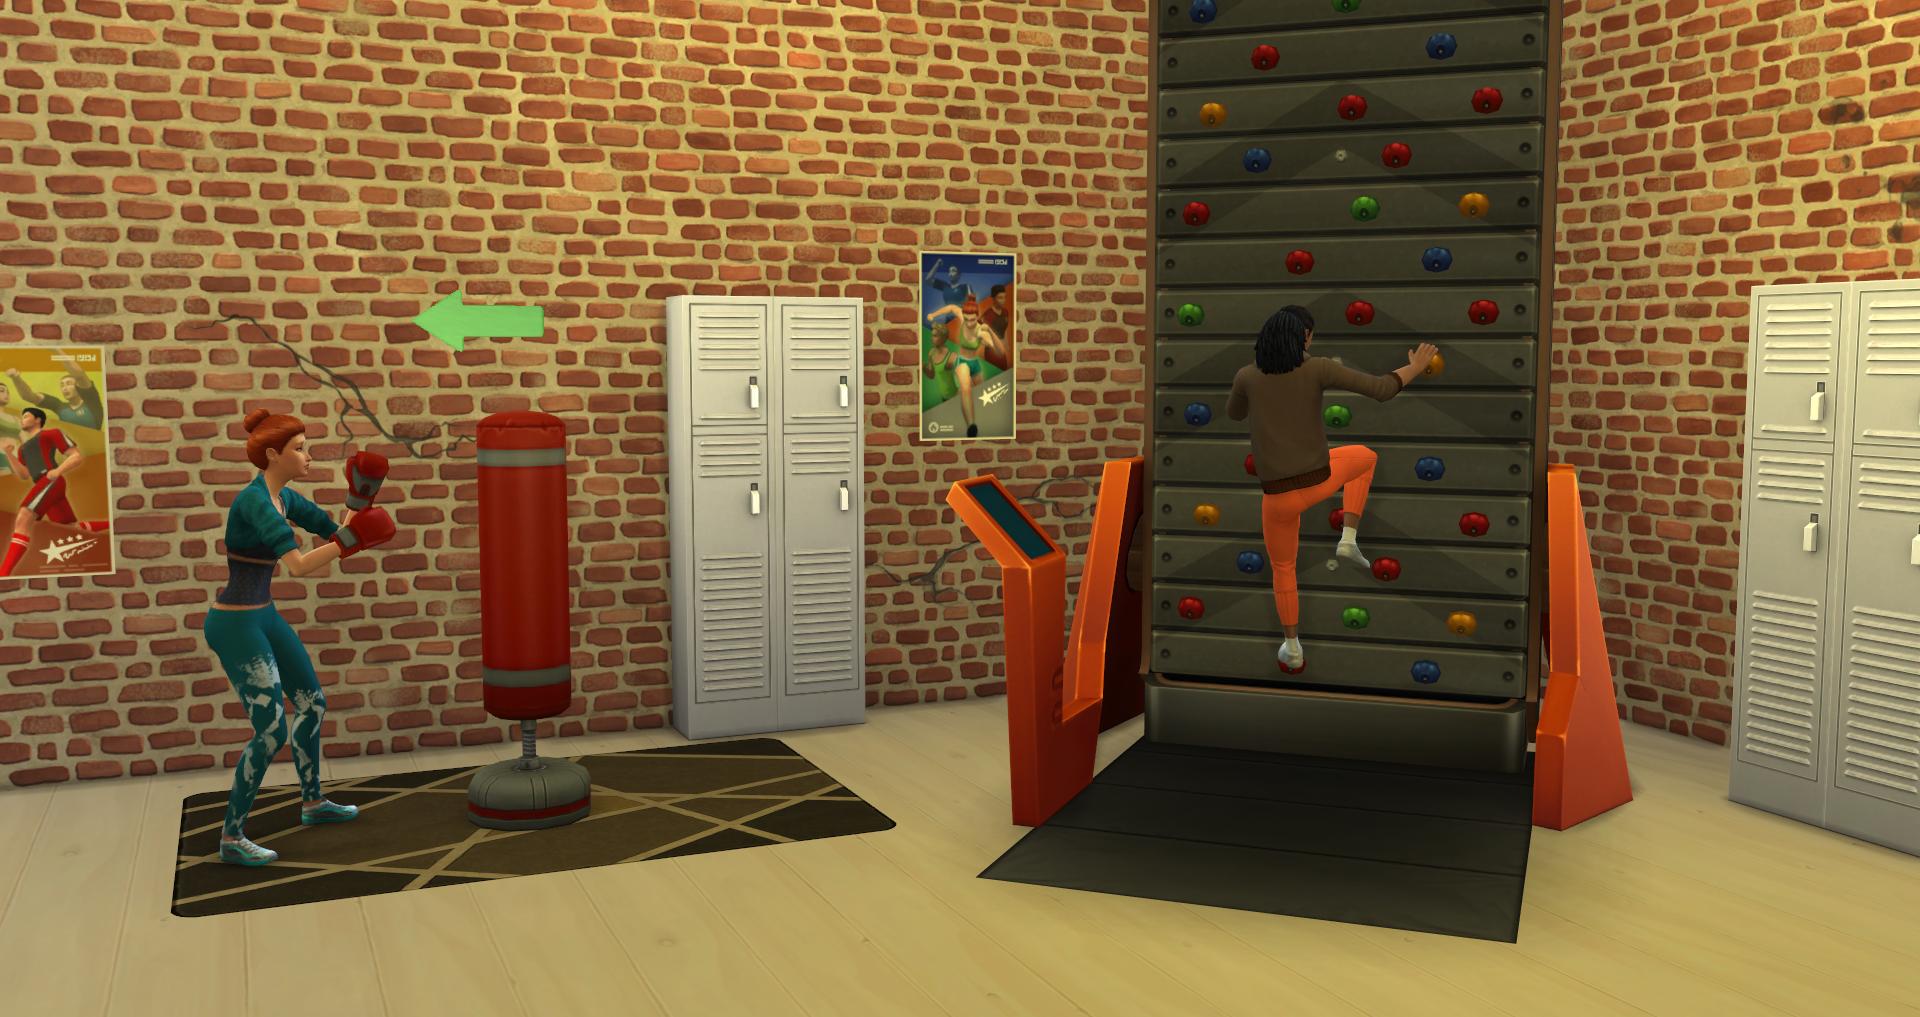 Výsledek obrázku pro the sims 4 fitness wall